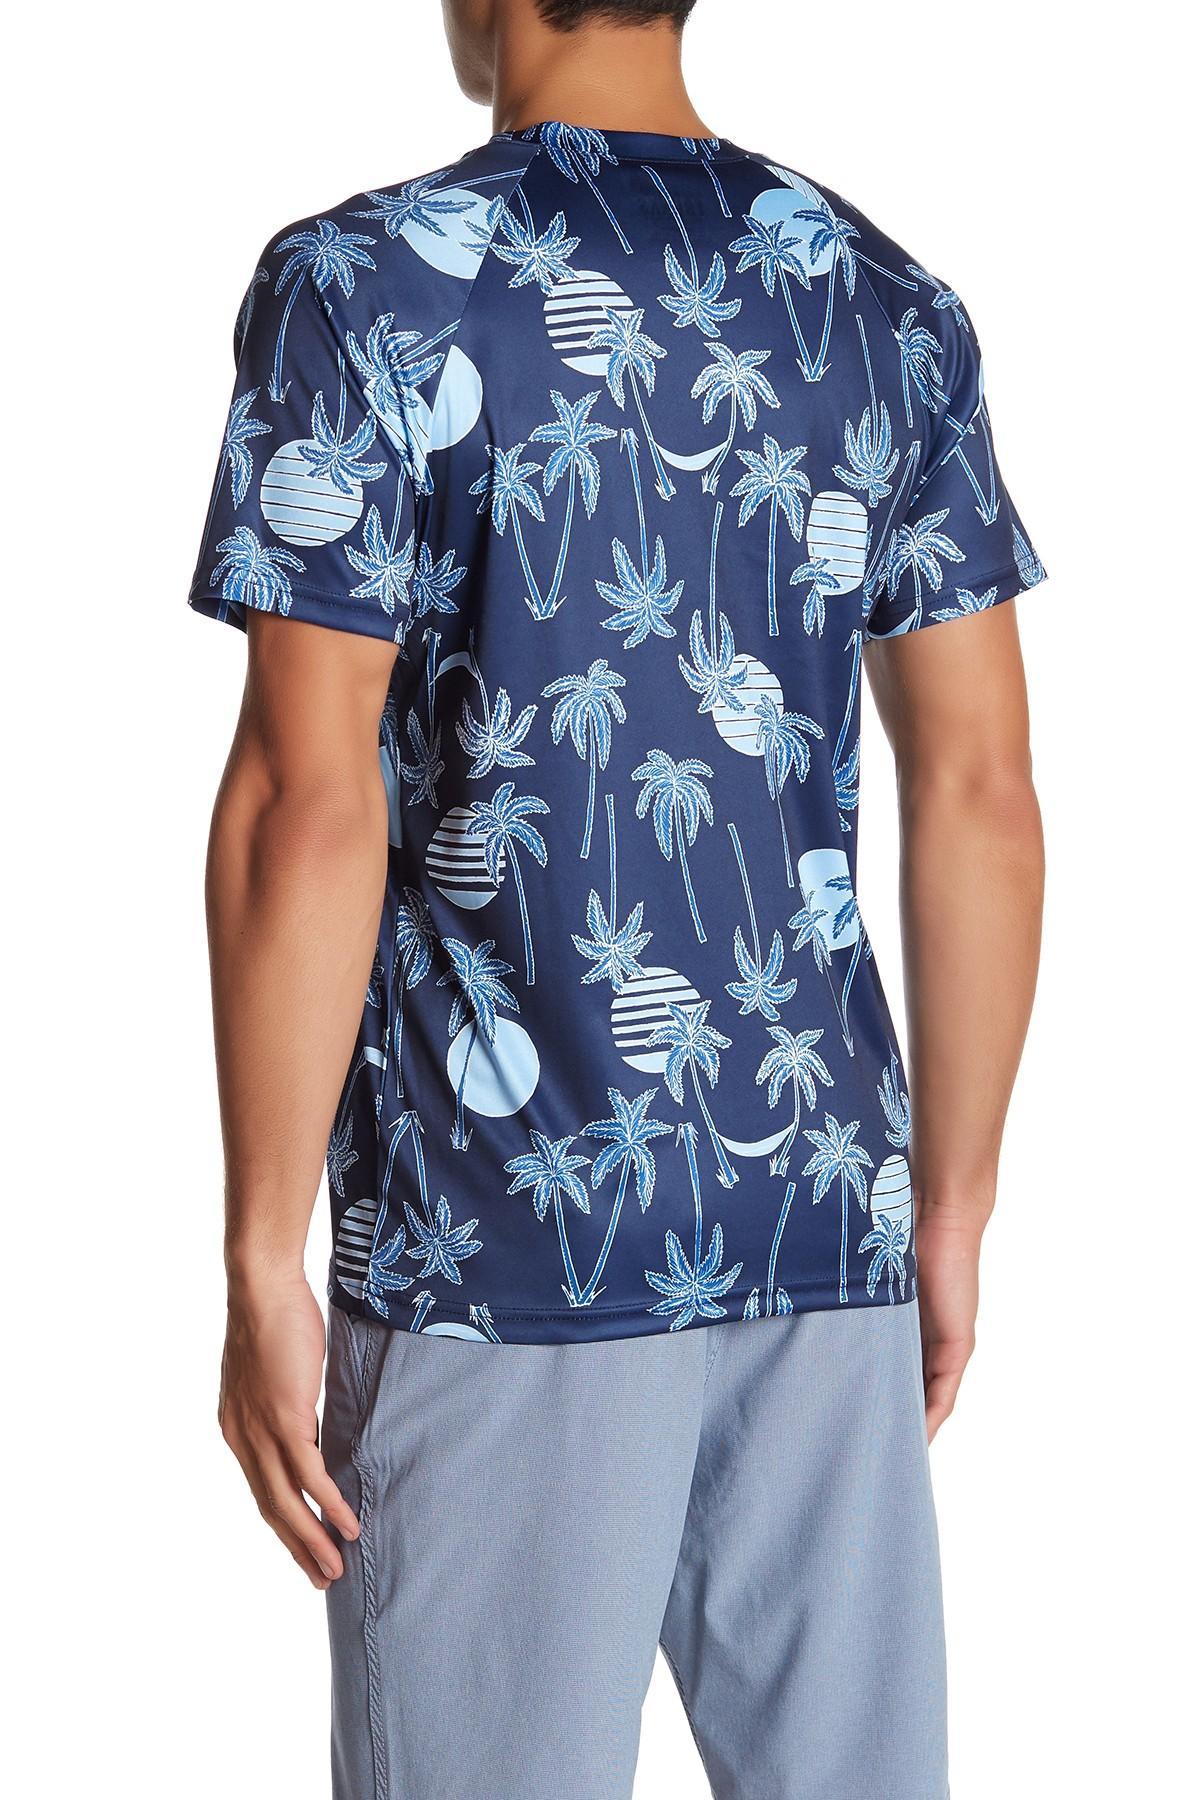 6e20e98eda9dd TRUNKS SURF AND SWIM CO - Blue Tropical Palm Print Upf 50+ Swim T-. View  fullscreen